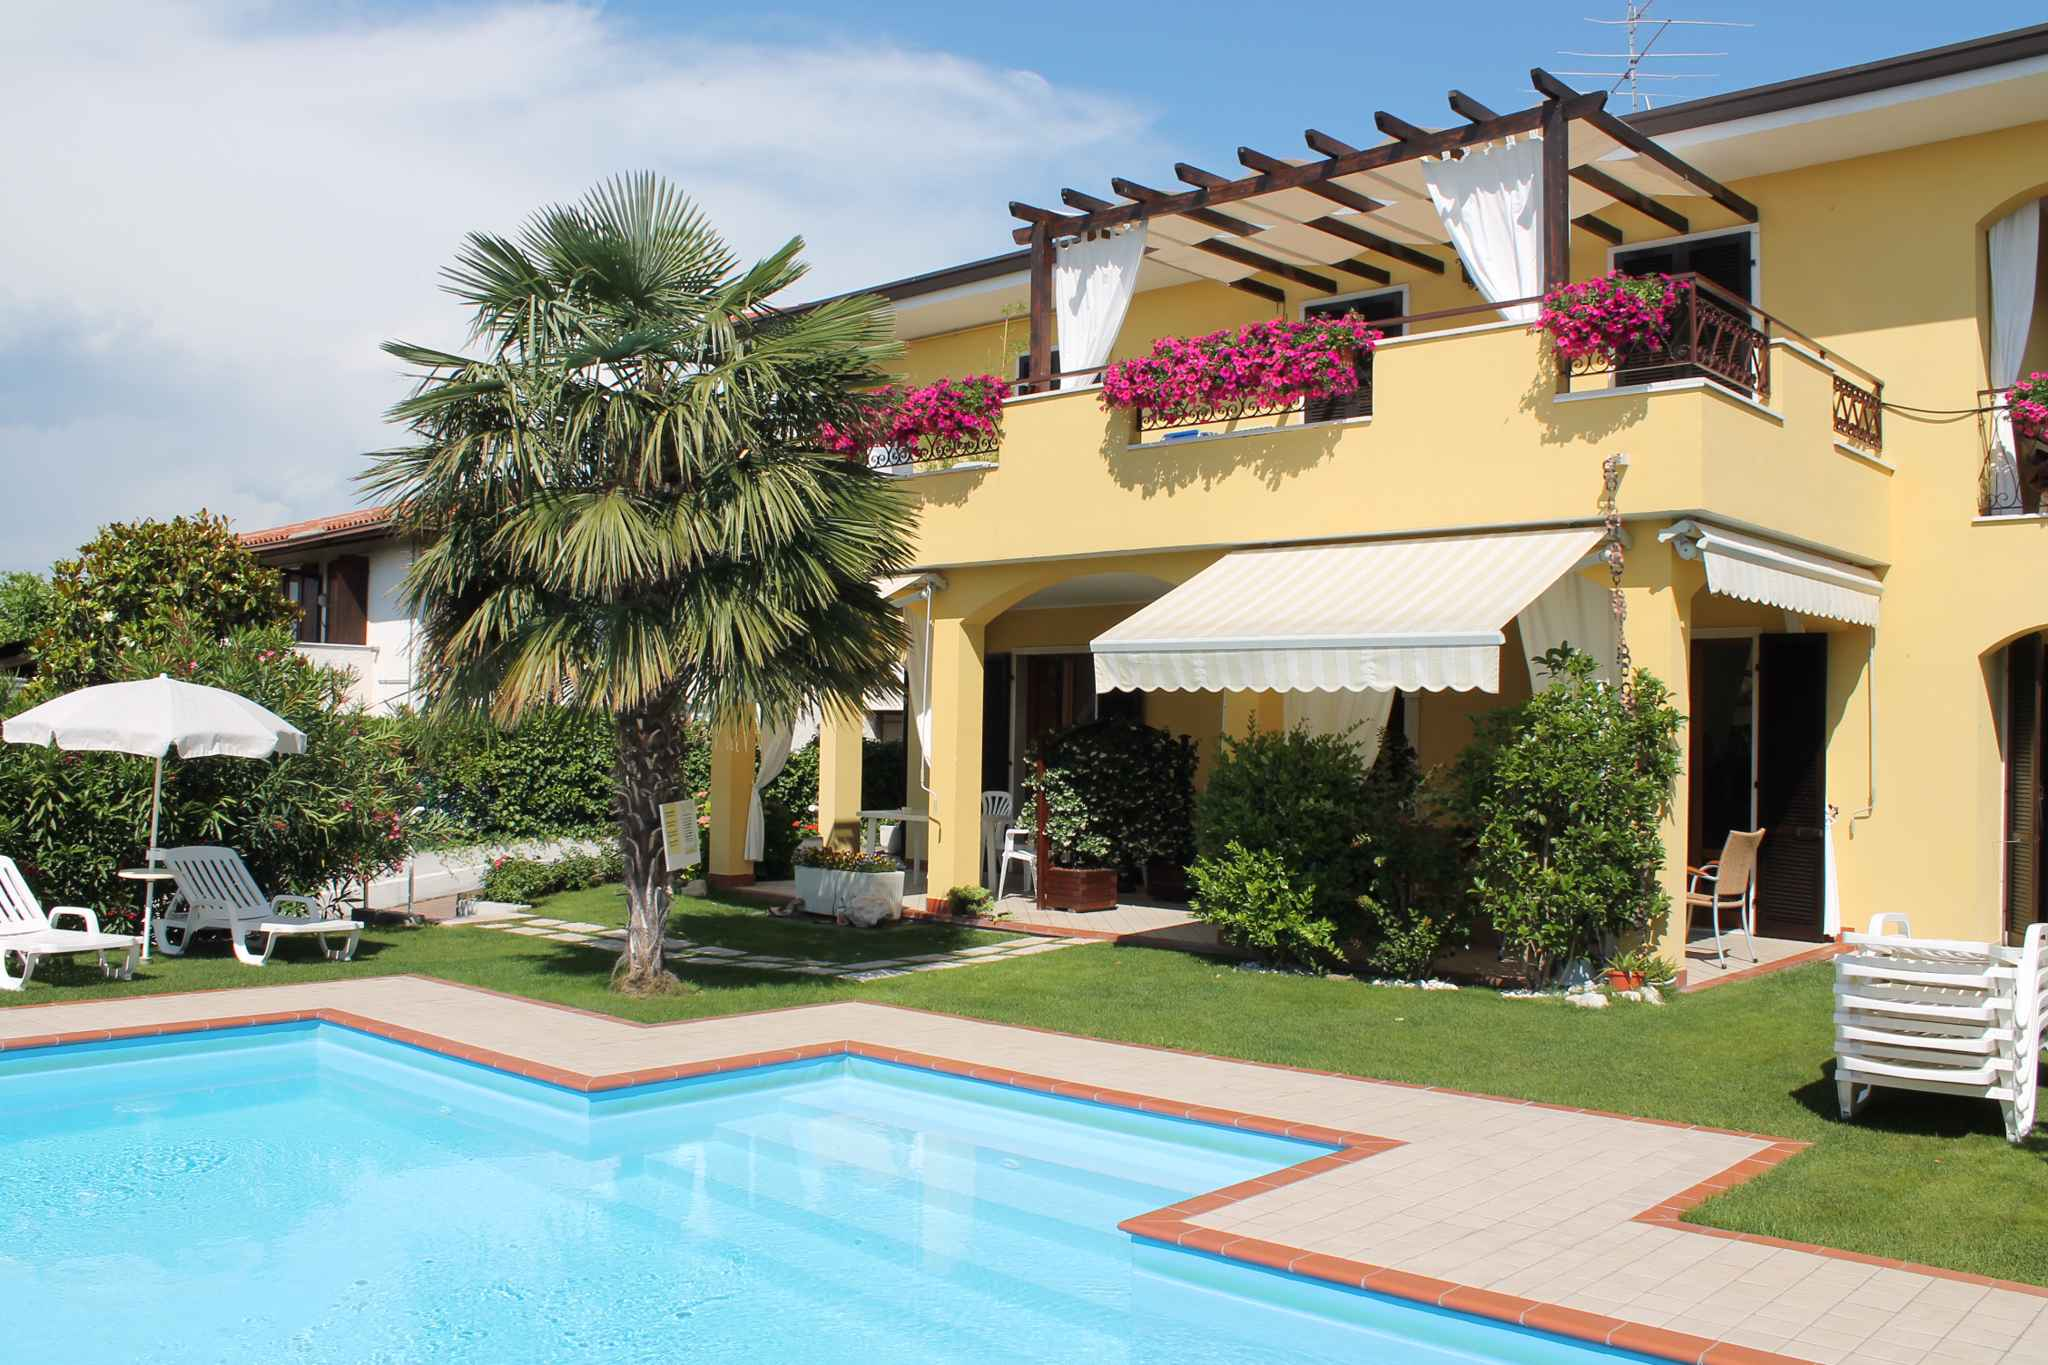 Ferienwohnung con piscina esterna (279596), Lazise, Gardasee, Venetien, Italien, Bild 3